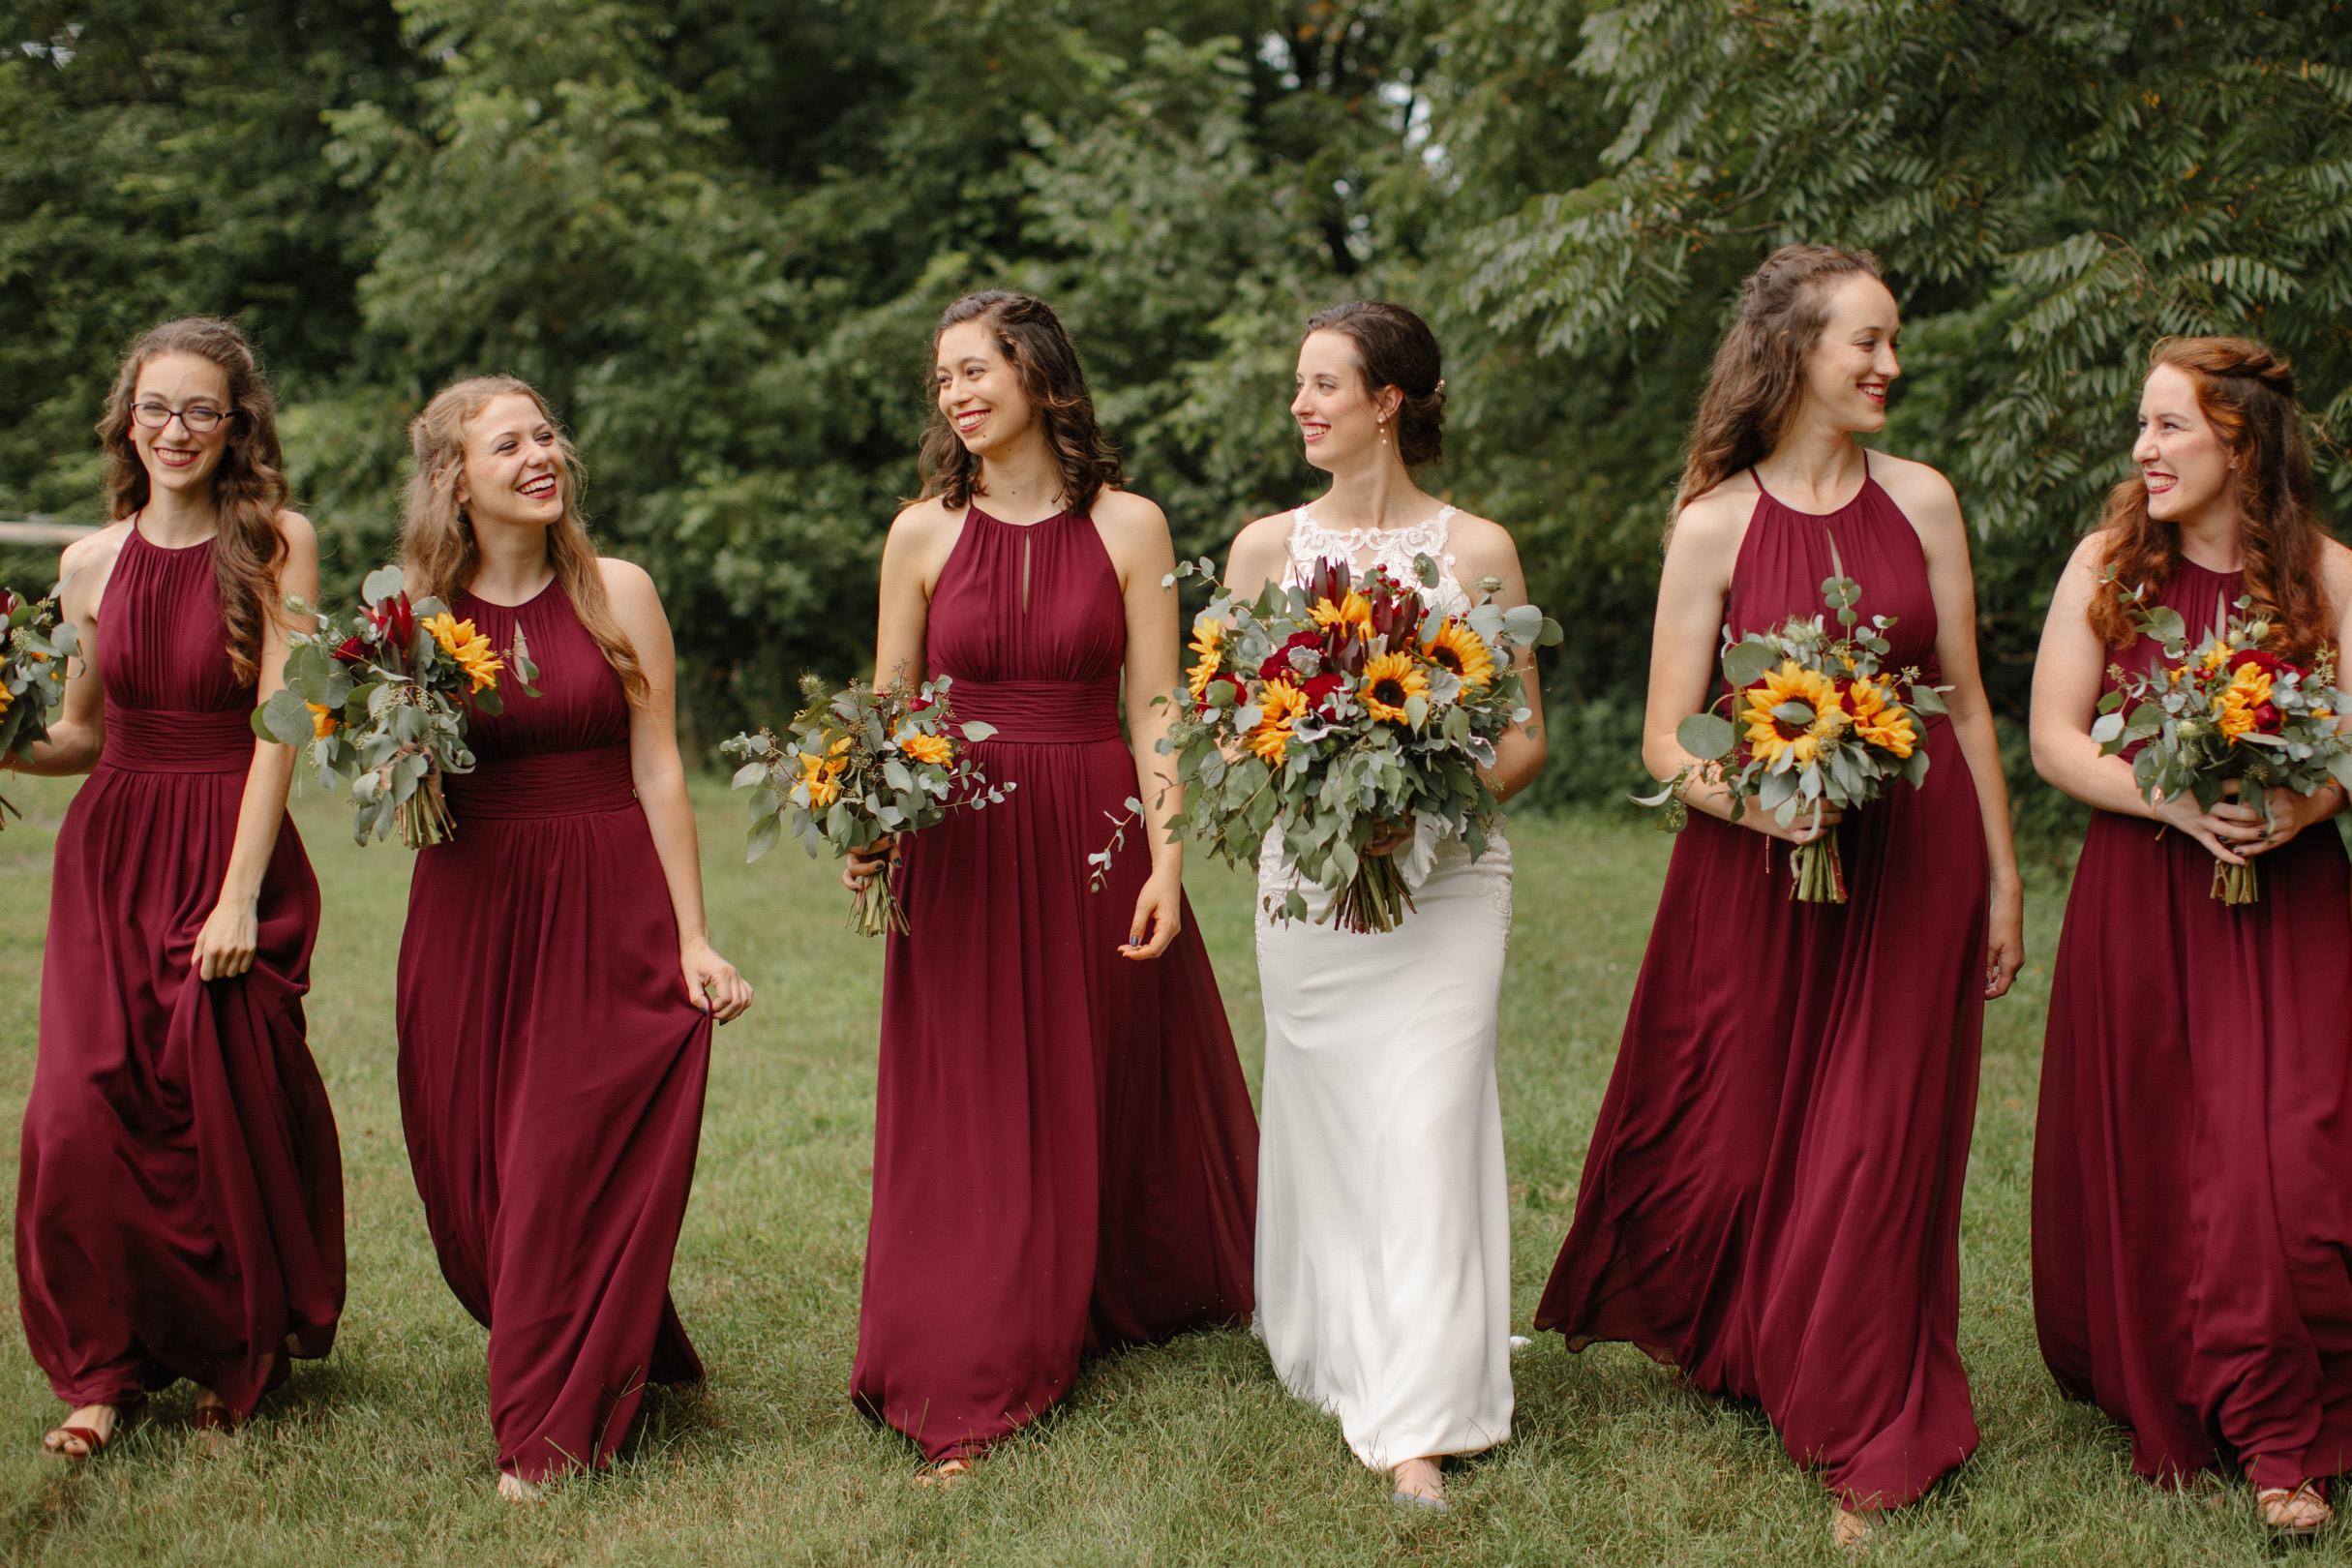 elegant bridesmaids walking together with bride des Moines wedding photography